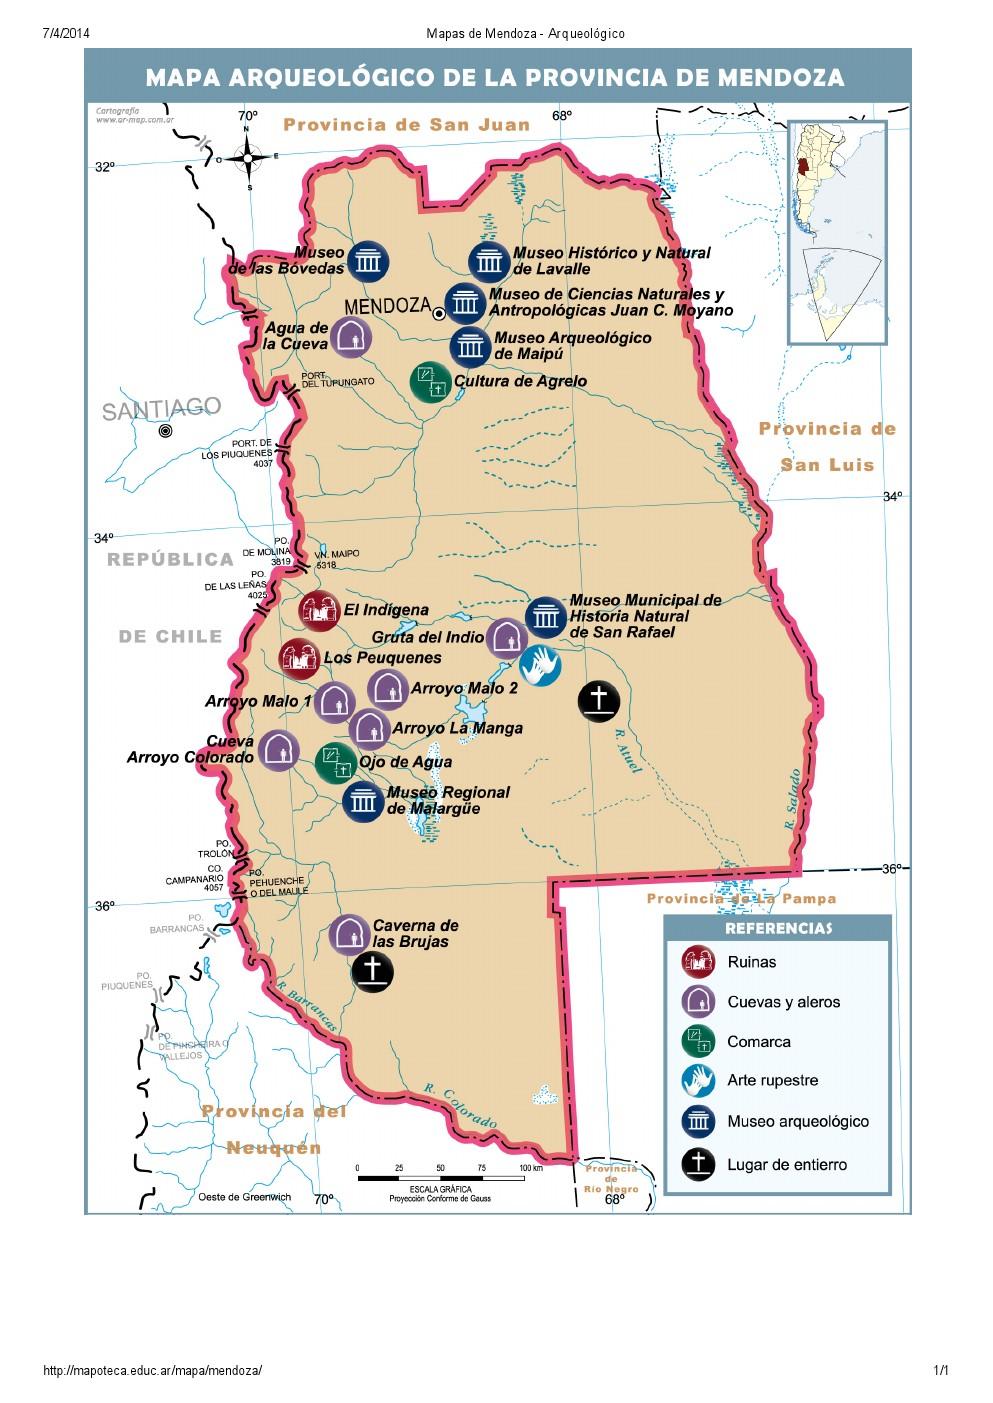 Mapa arqueológico de Mendoza. Mapoteca de Educ.ar